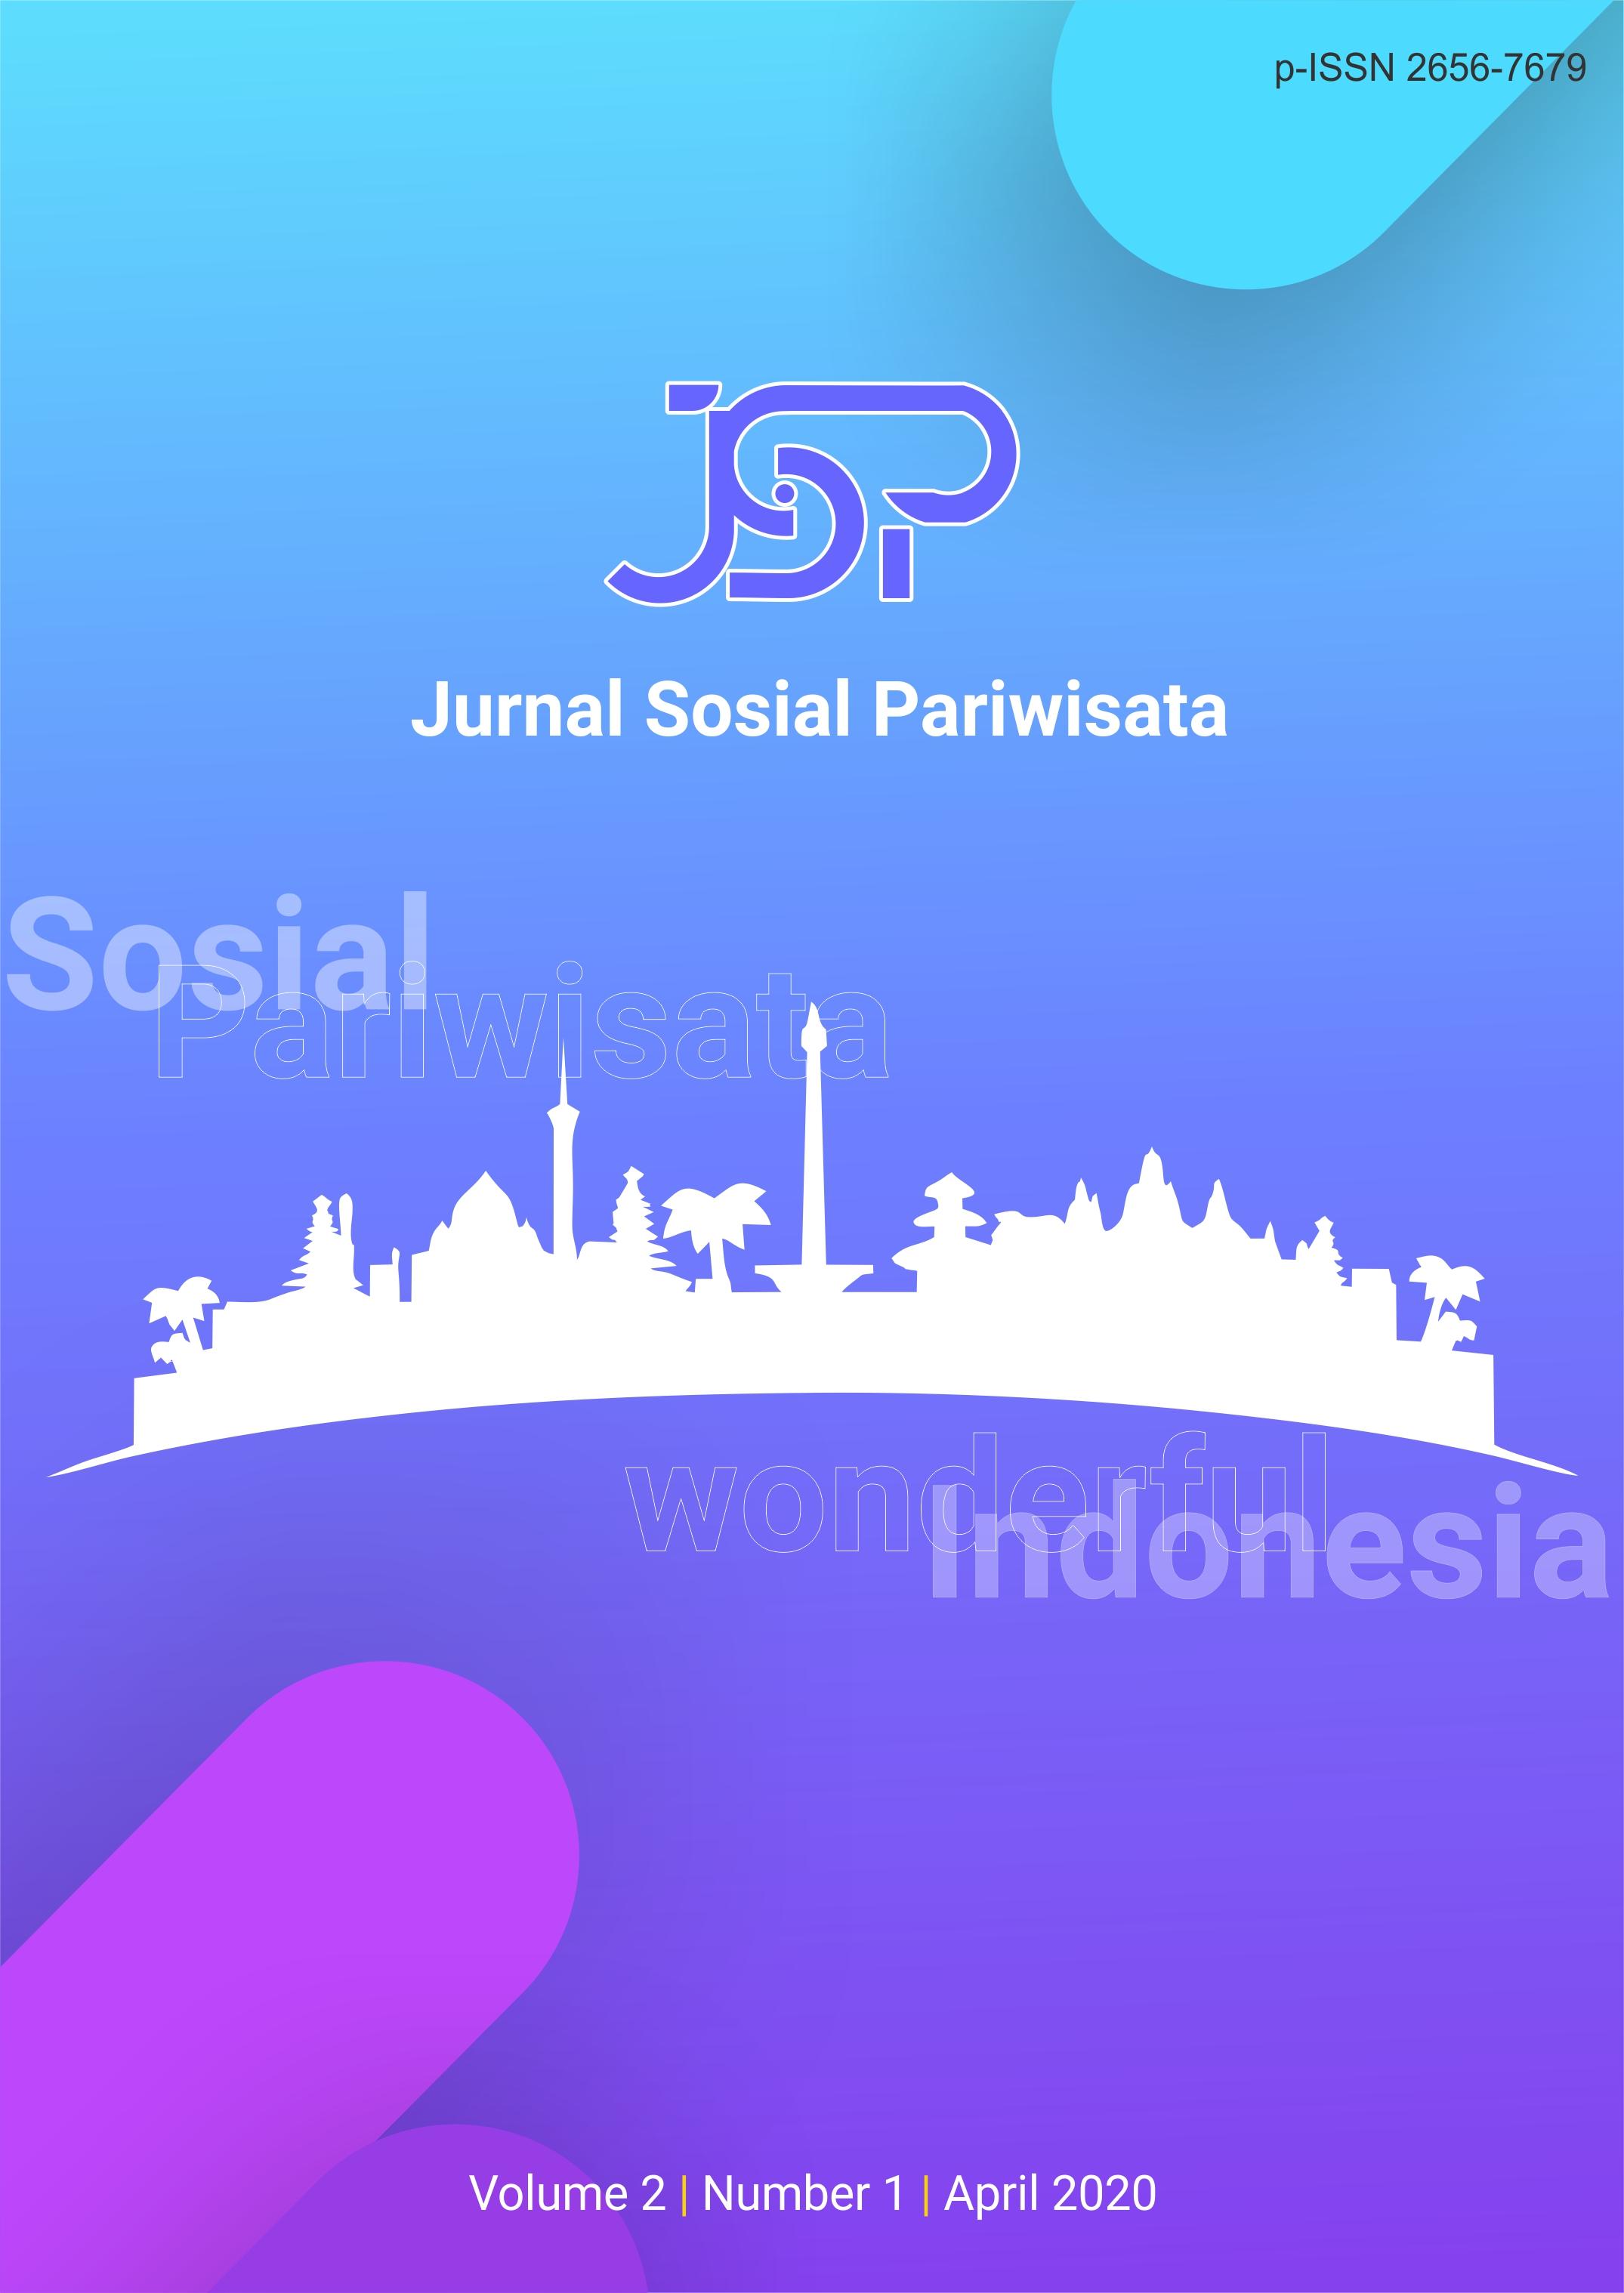 View Vol. 2 No. 1 (2020): Jurnal Sosial Pariwisata April 2020